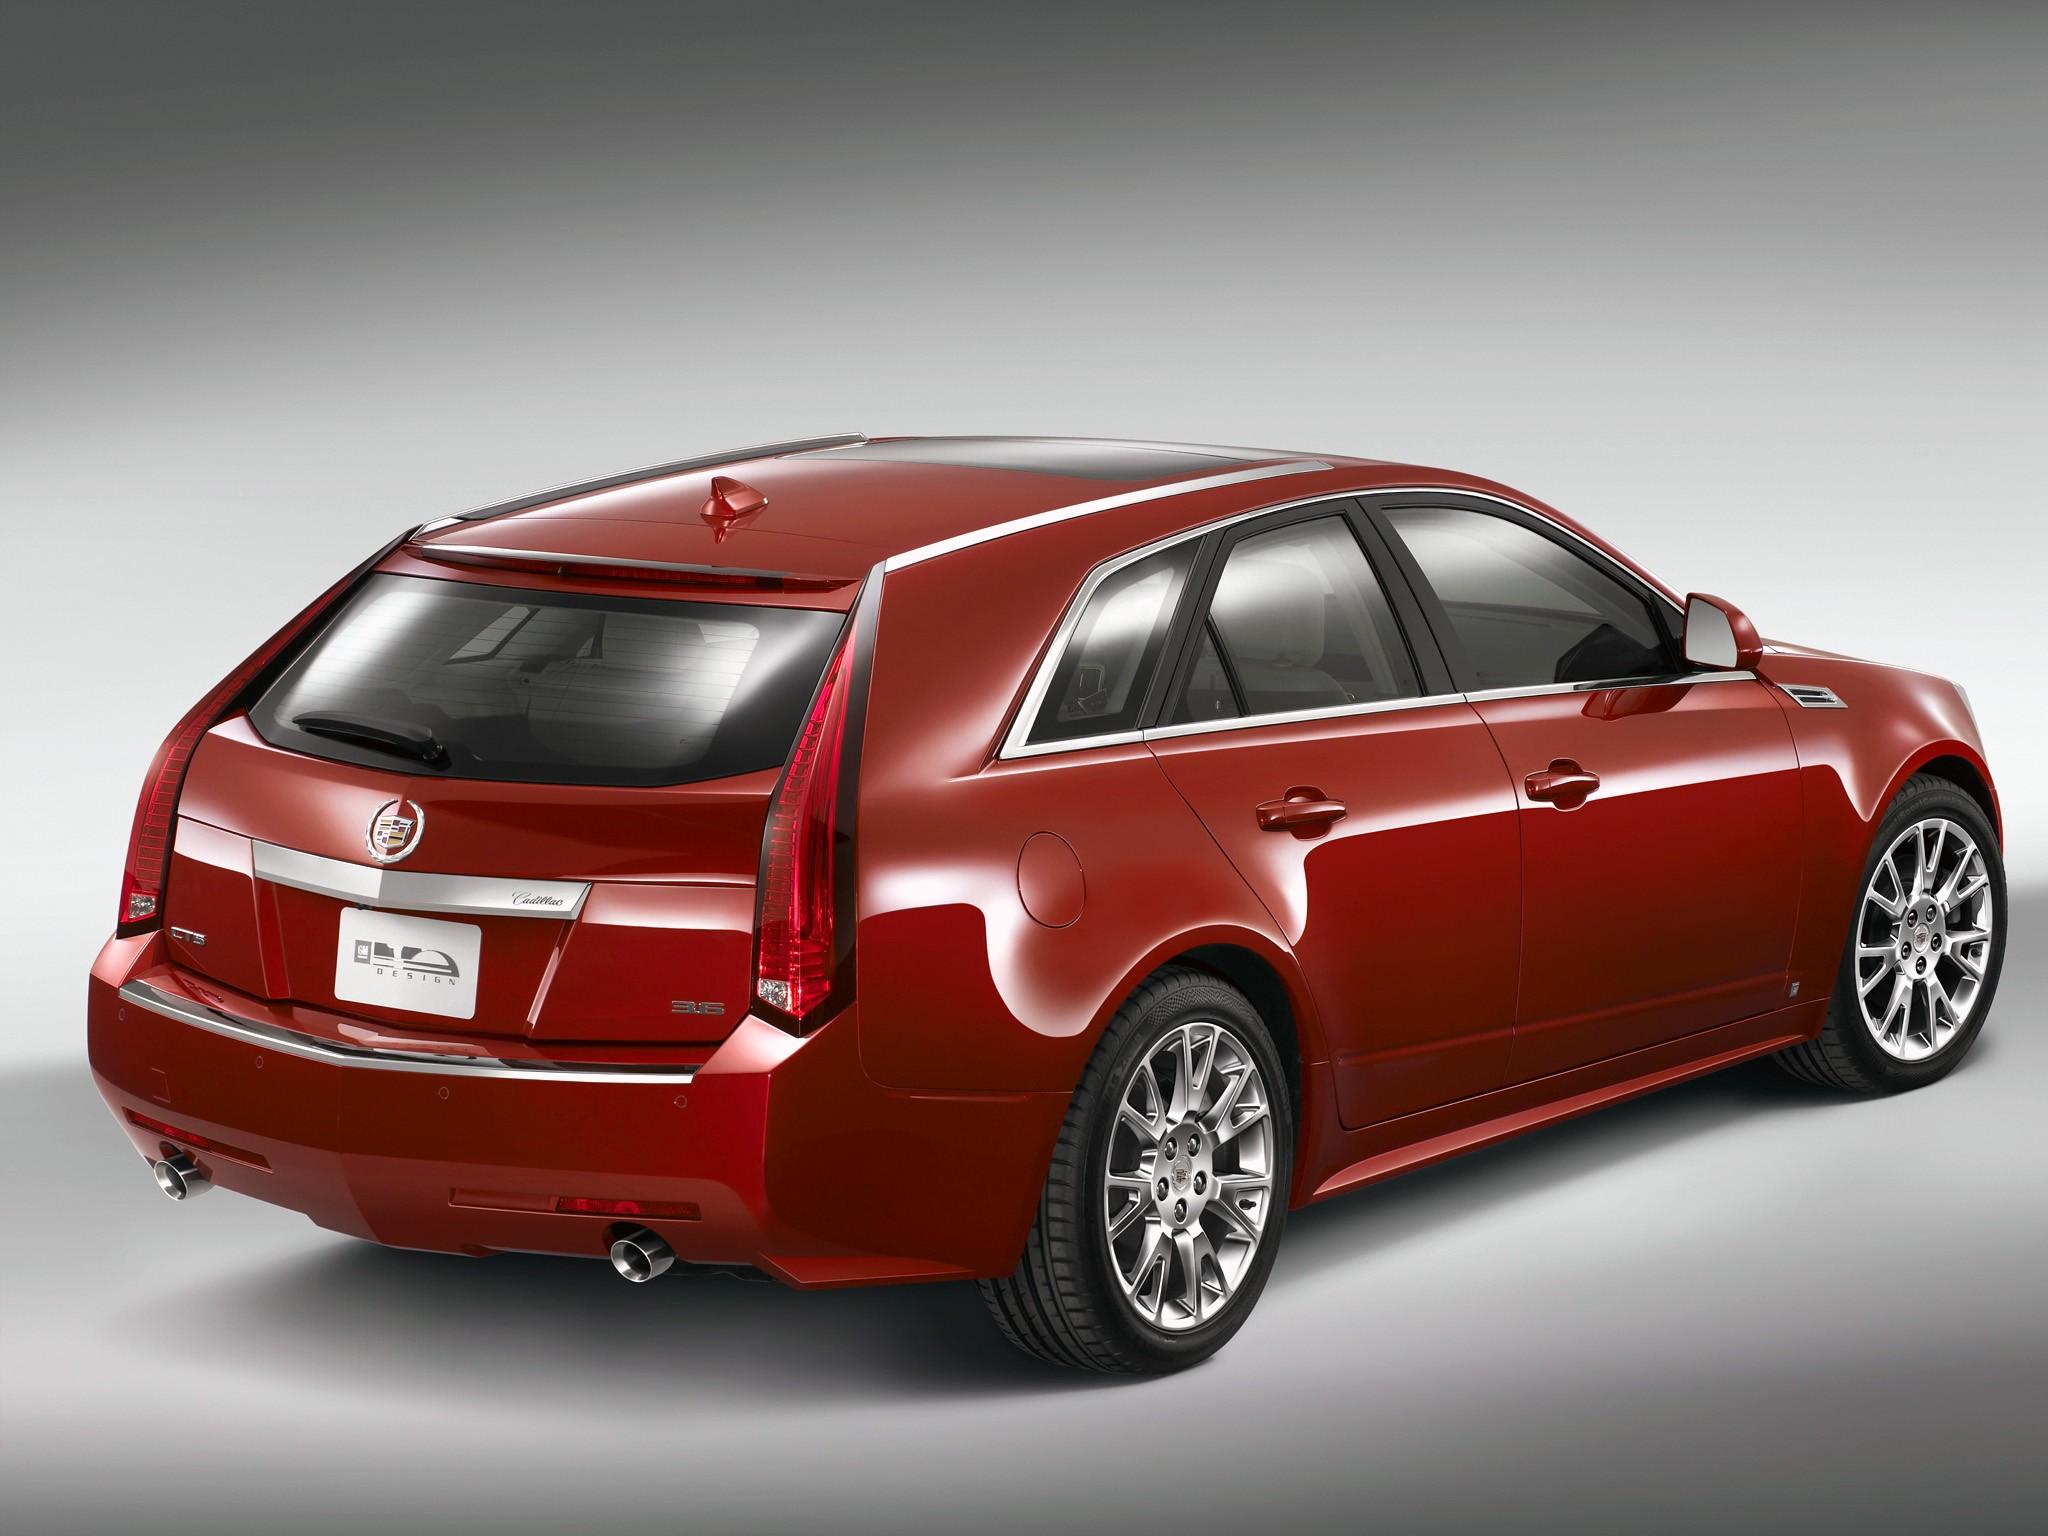 cadillac cts sport wagon specs 2009 2010 2011 2012 2013 2014 autoevolution. Black Bedroom Furniture Sets. Home Design Ideas